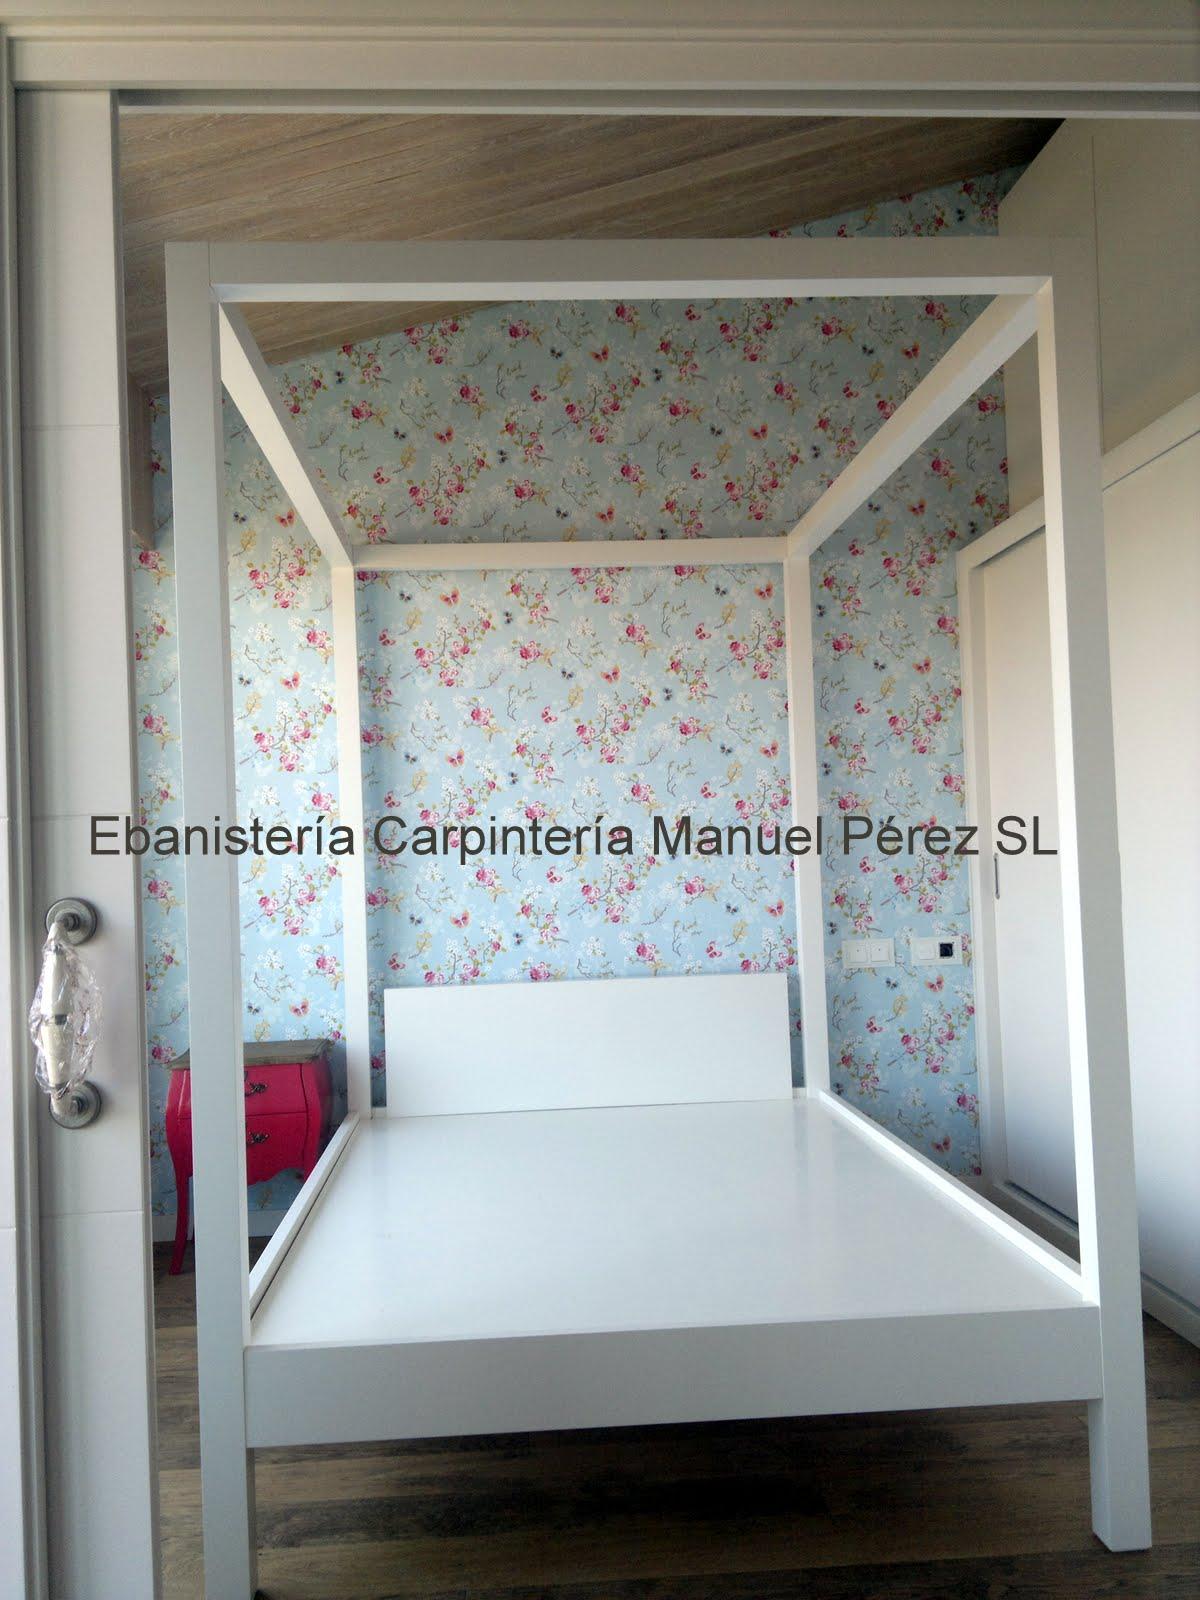 EBANISTERIA CARPINTERIA MANUEL PEREZ ( Zaragoza ): Cama con dosel, a ...